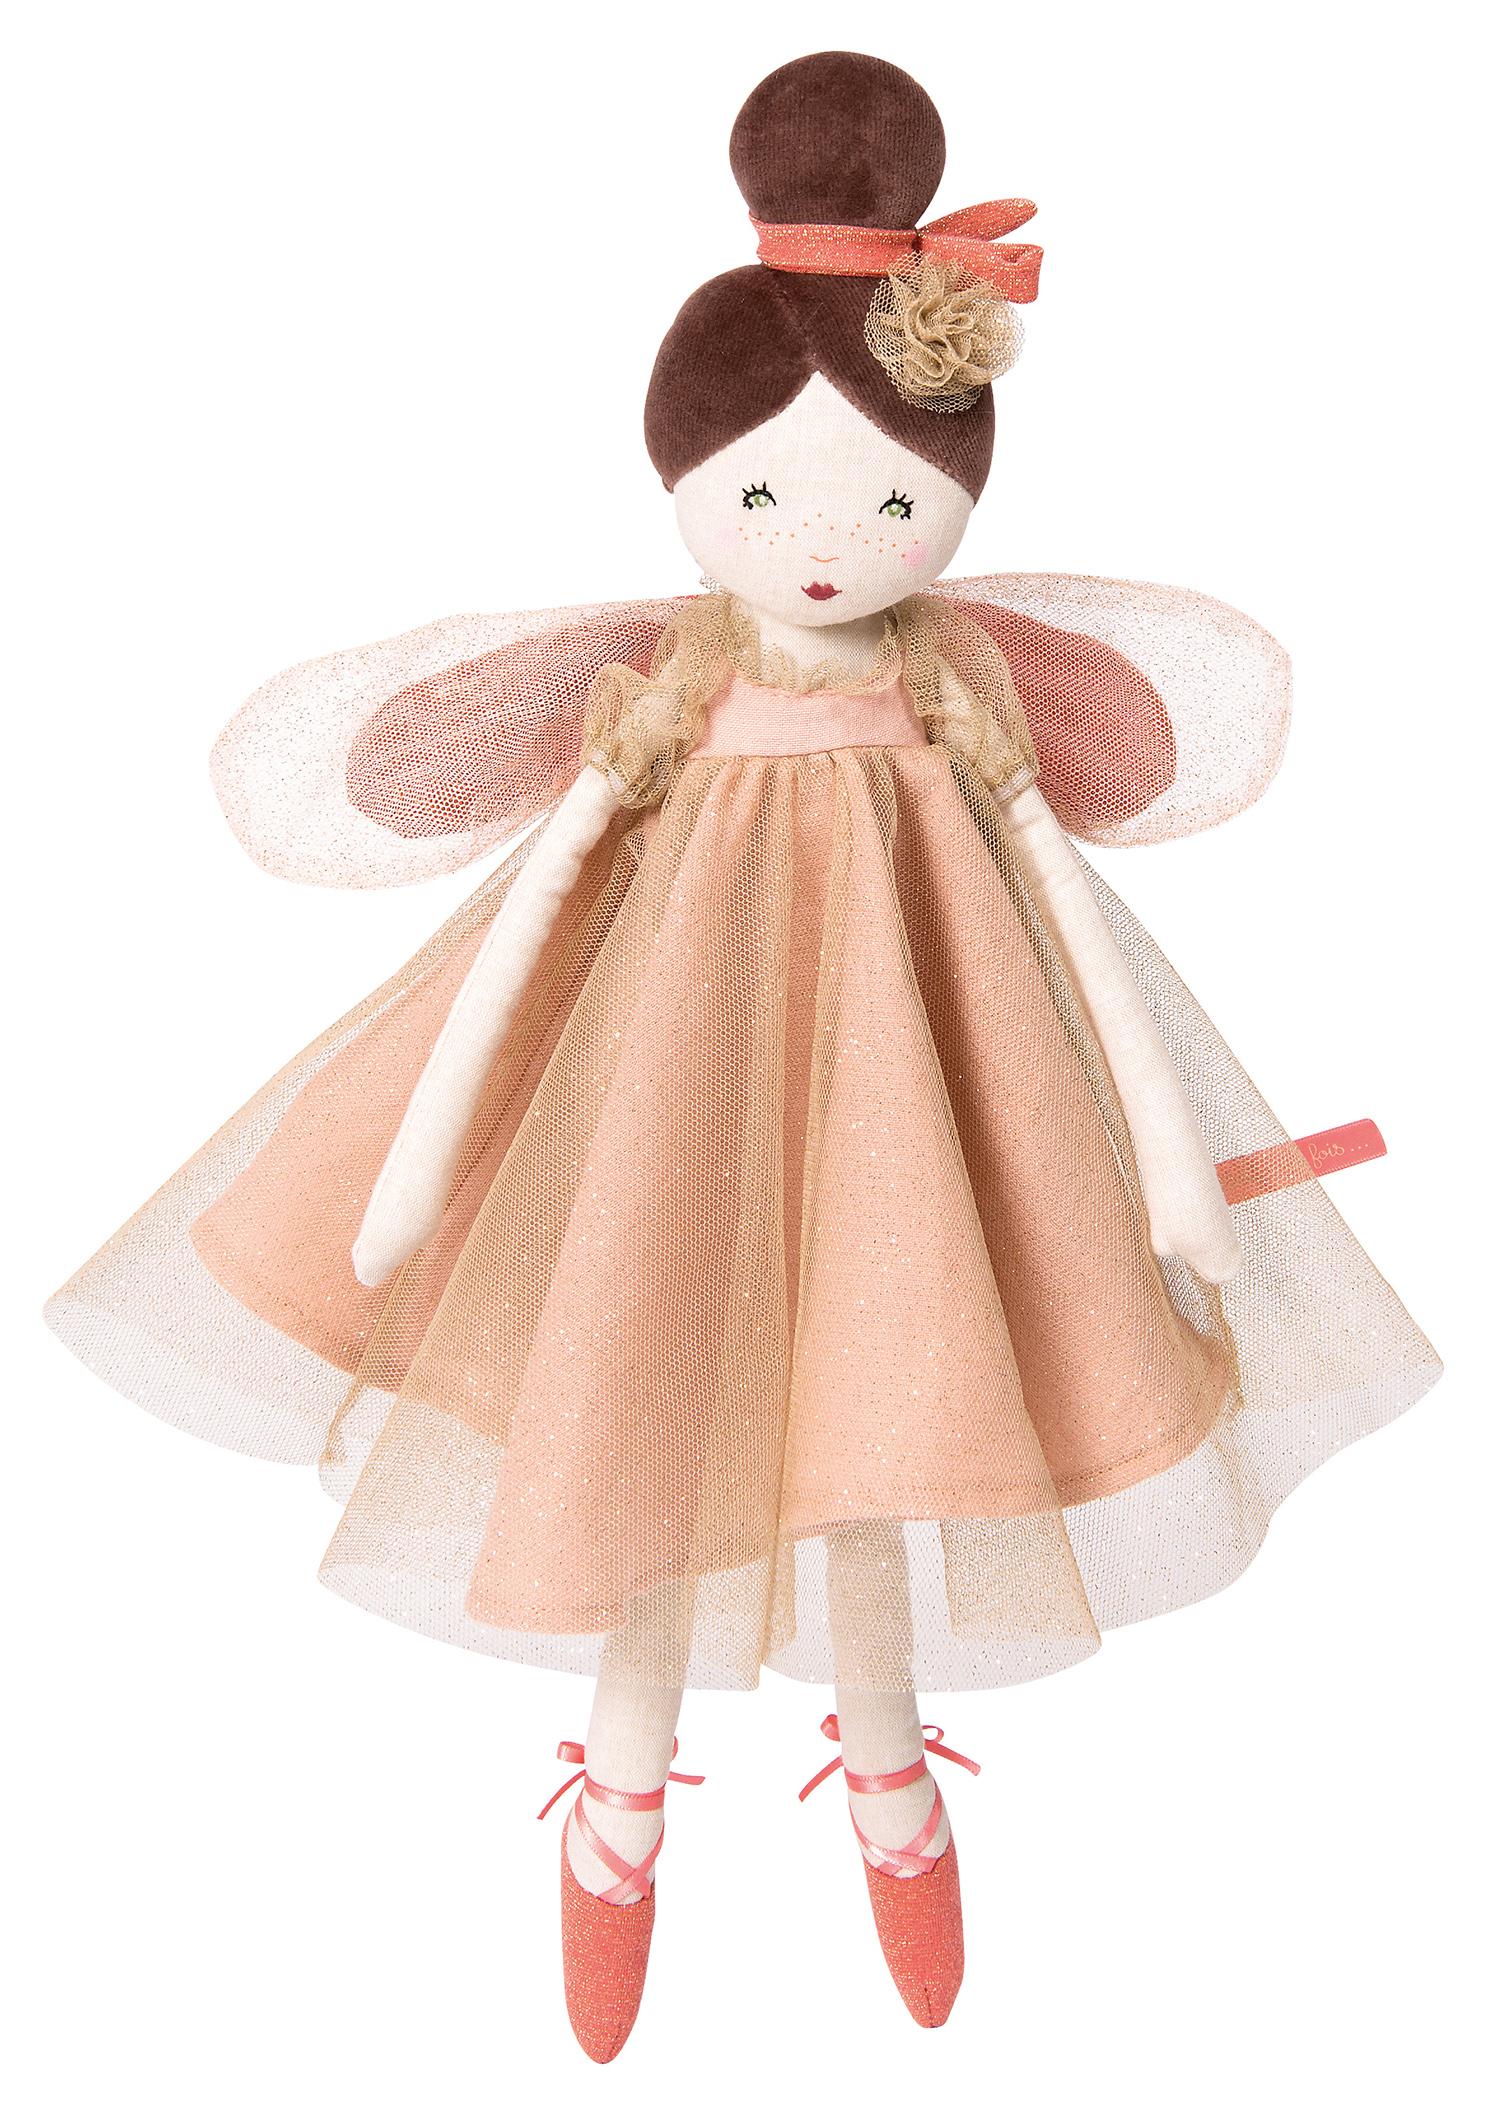 Bambola la fatina